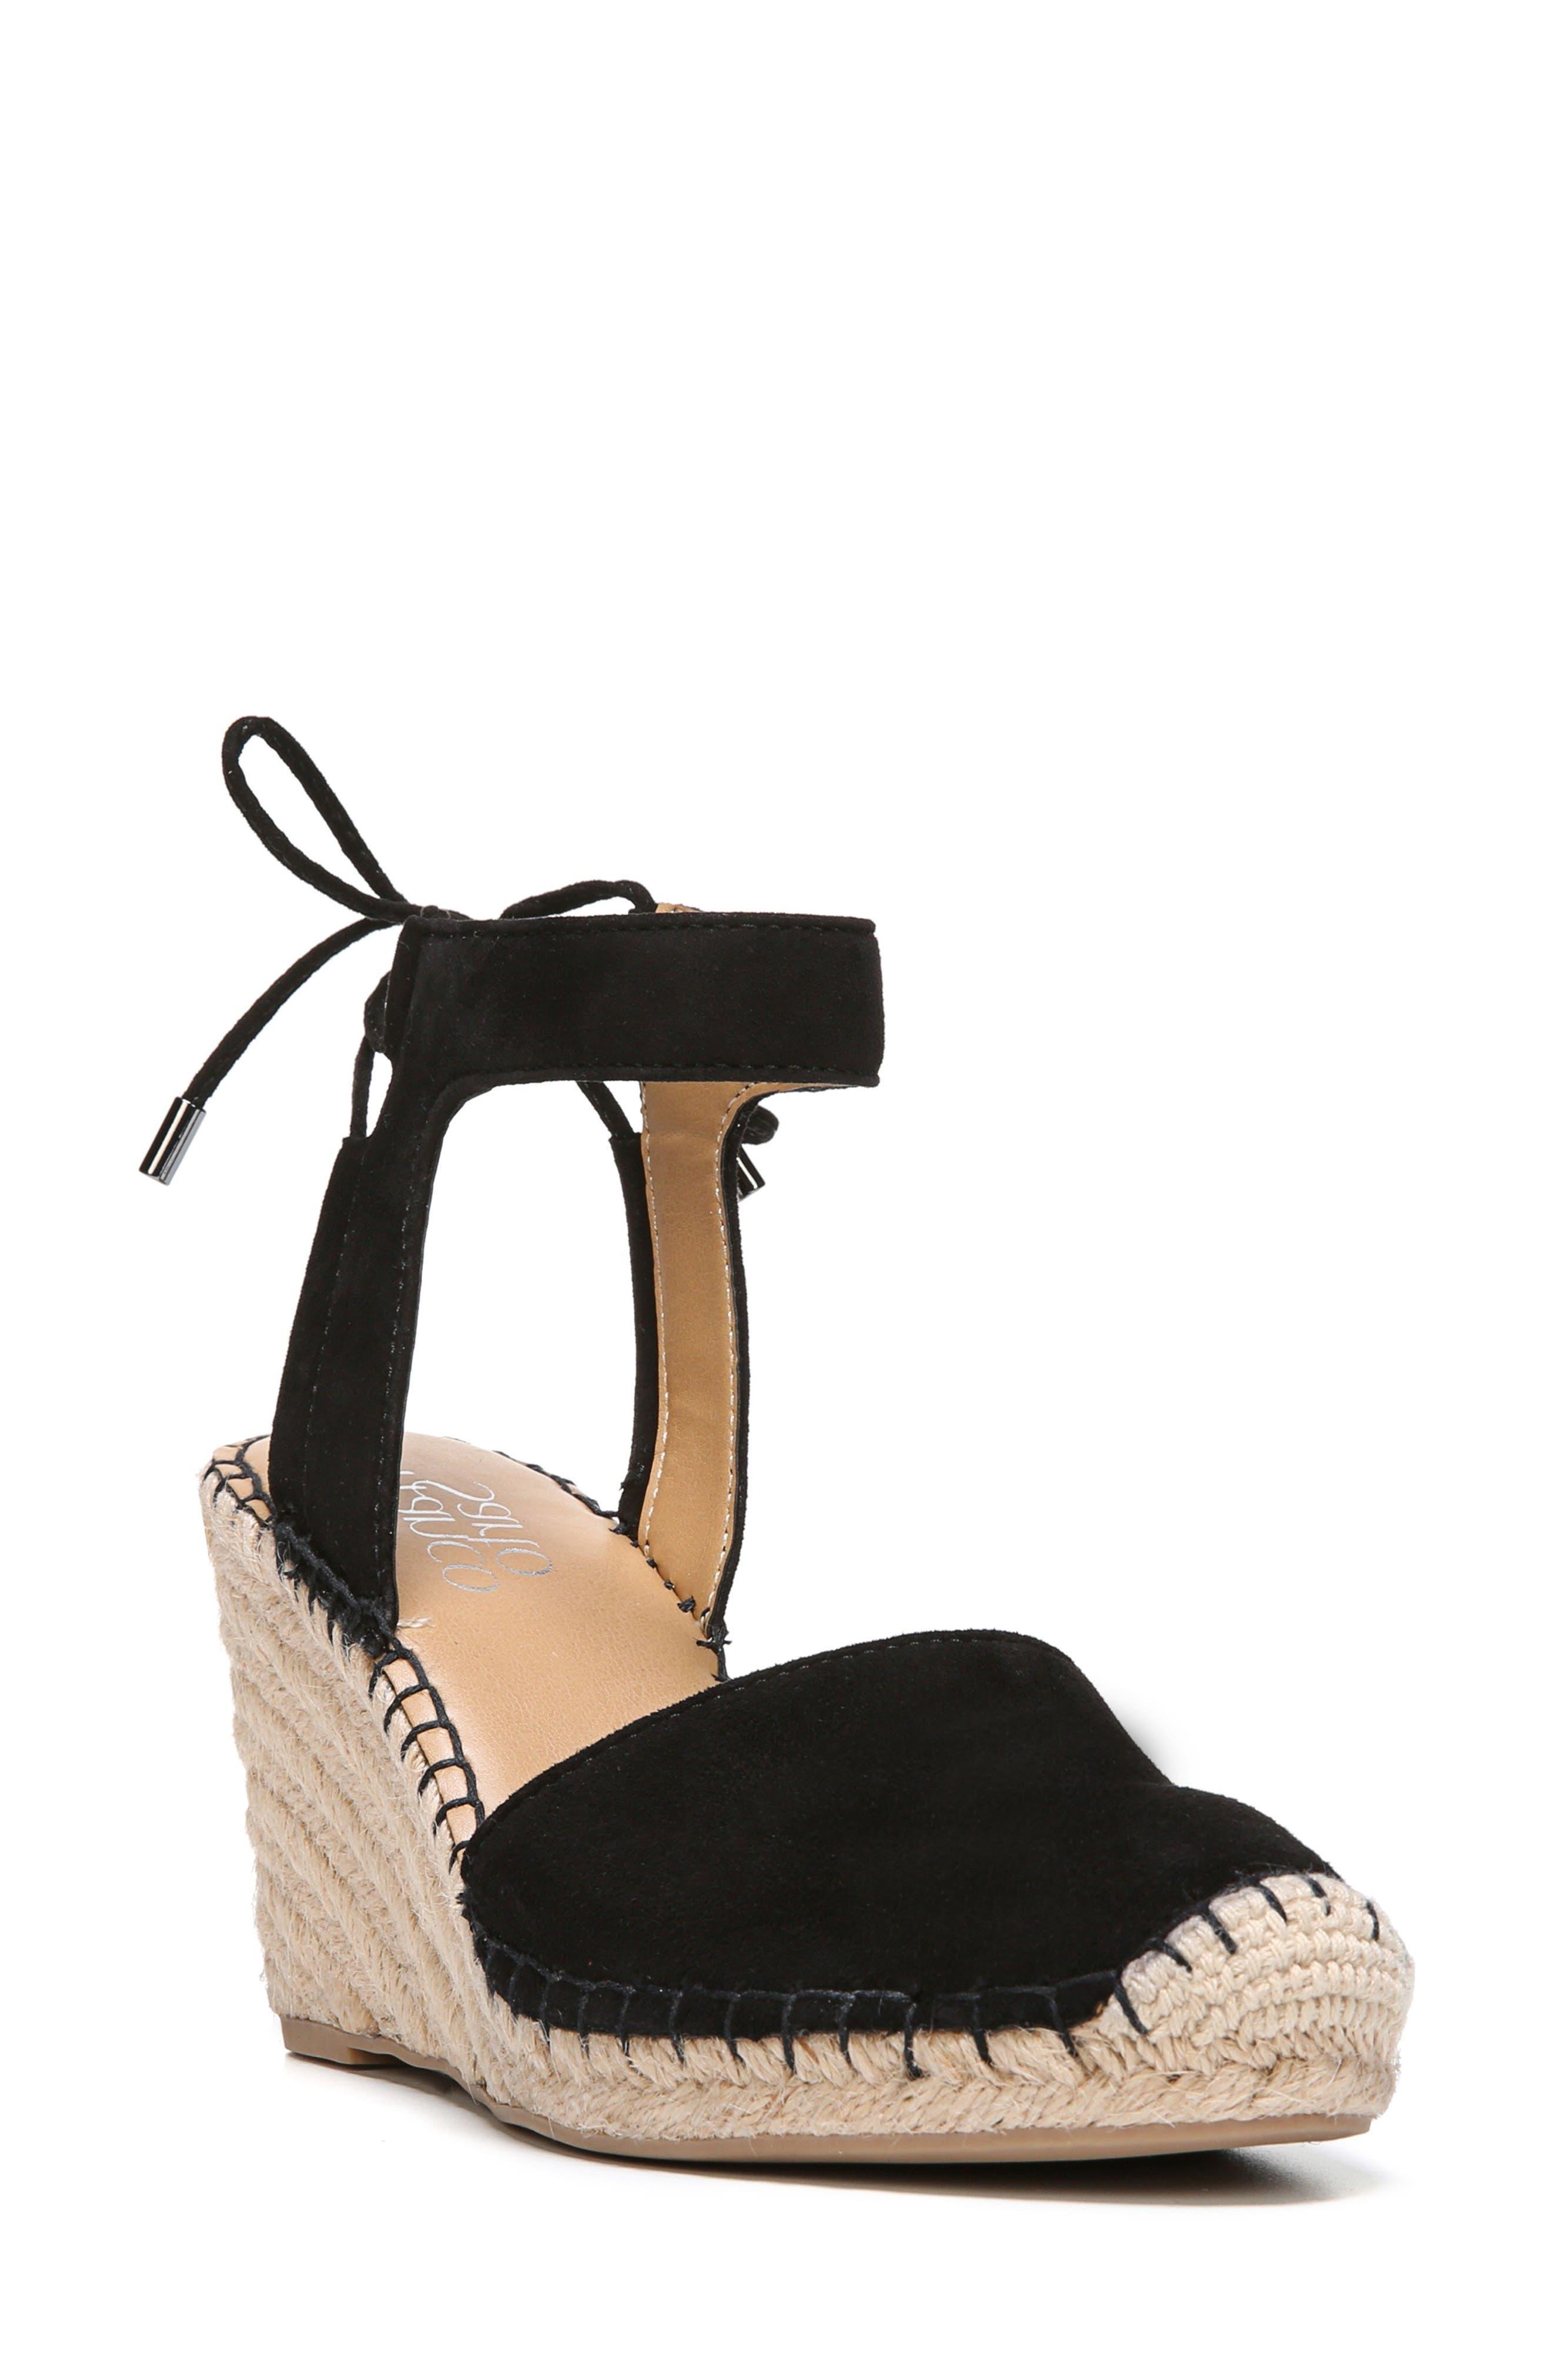 Mariska Espadrille Wedge Sandal,                             Main thumbnail 1, color,                             002